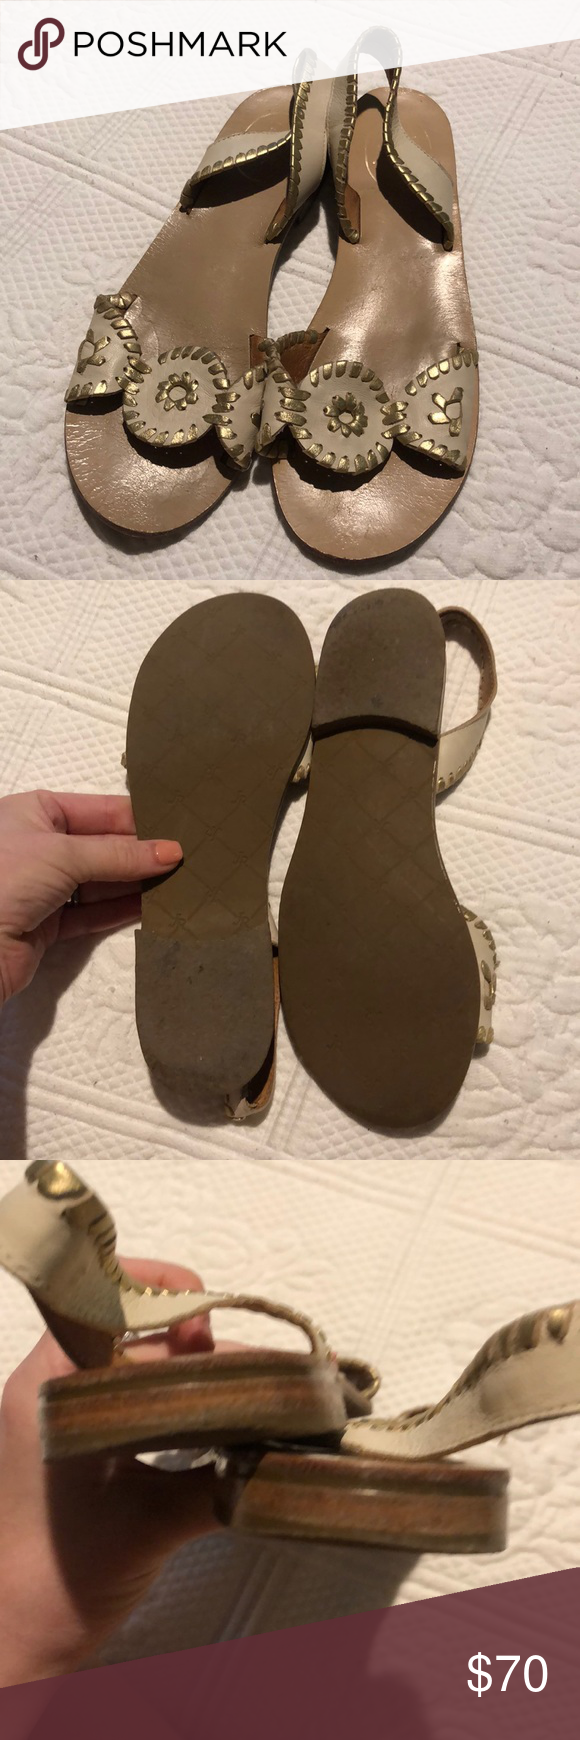 Jack Rogers Liliana Slingback Sandals Gently used, fits